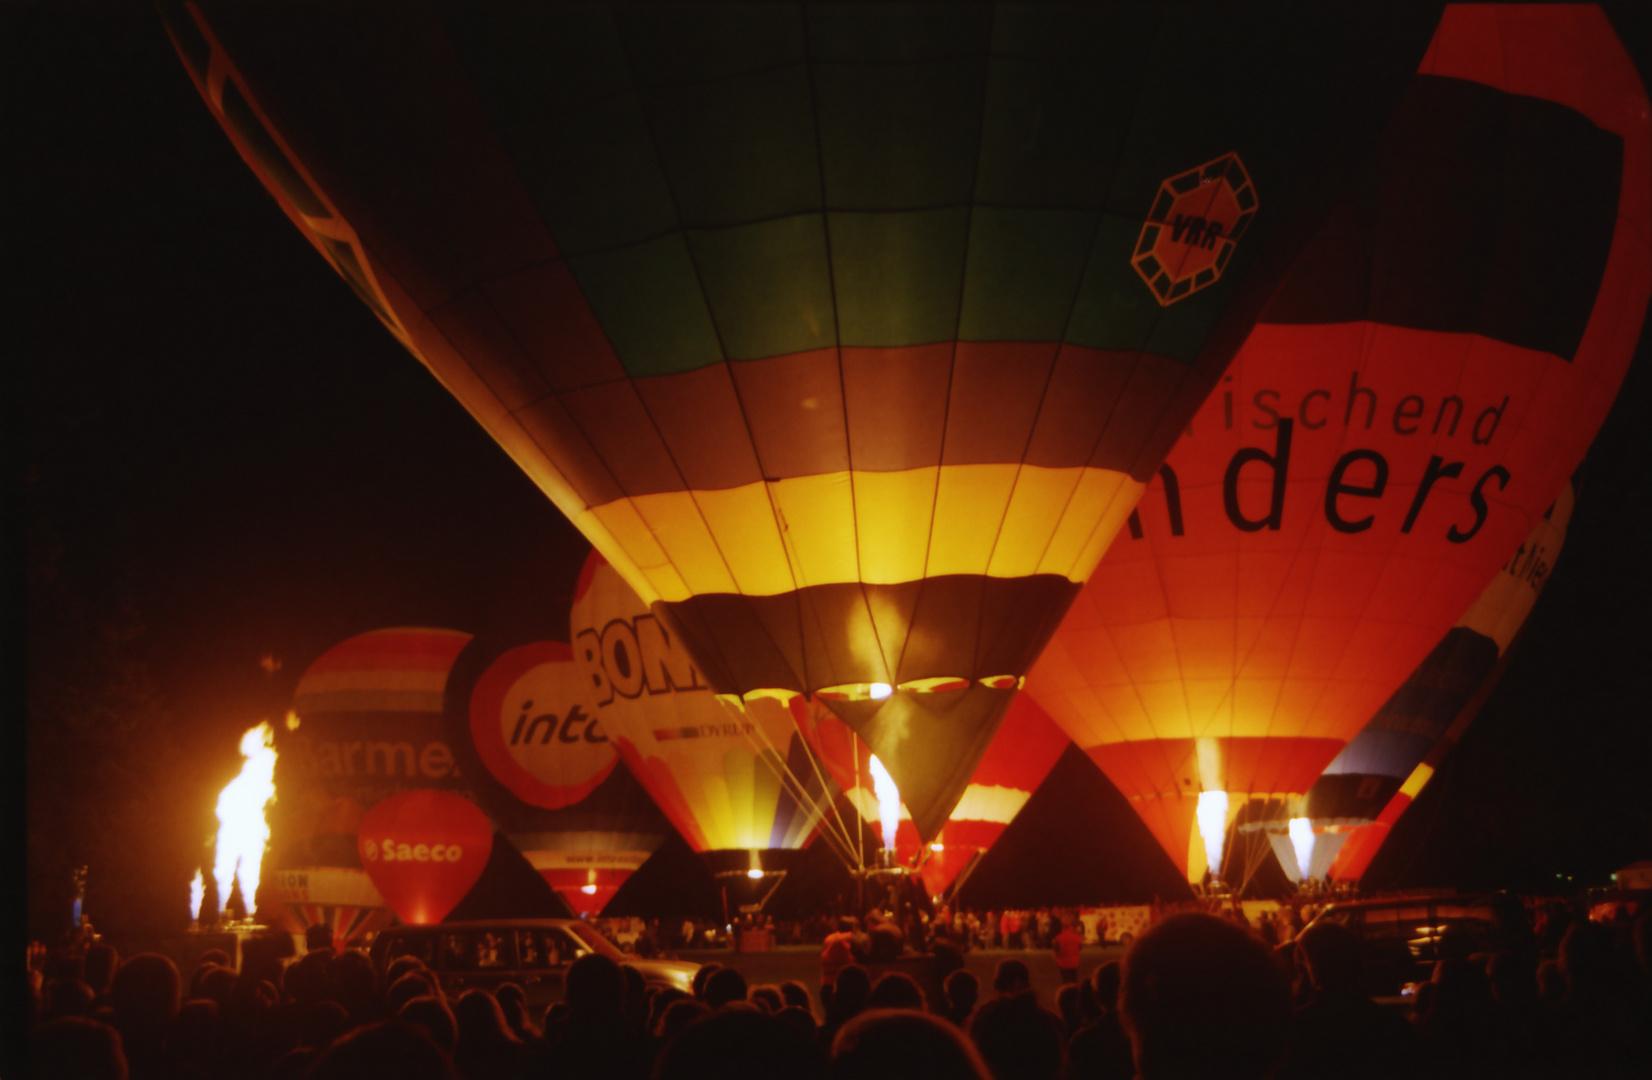 Ballonfestival Moers 2012 Ballonglühen